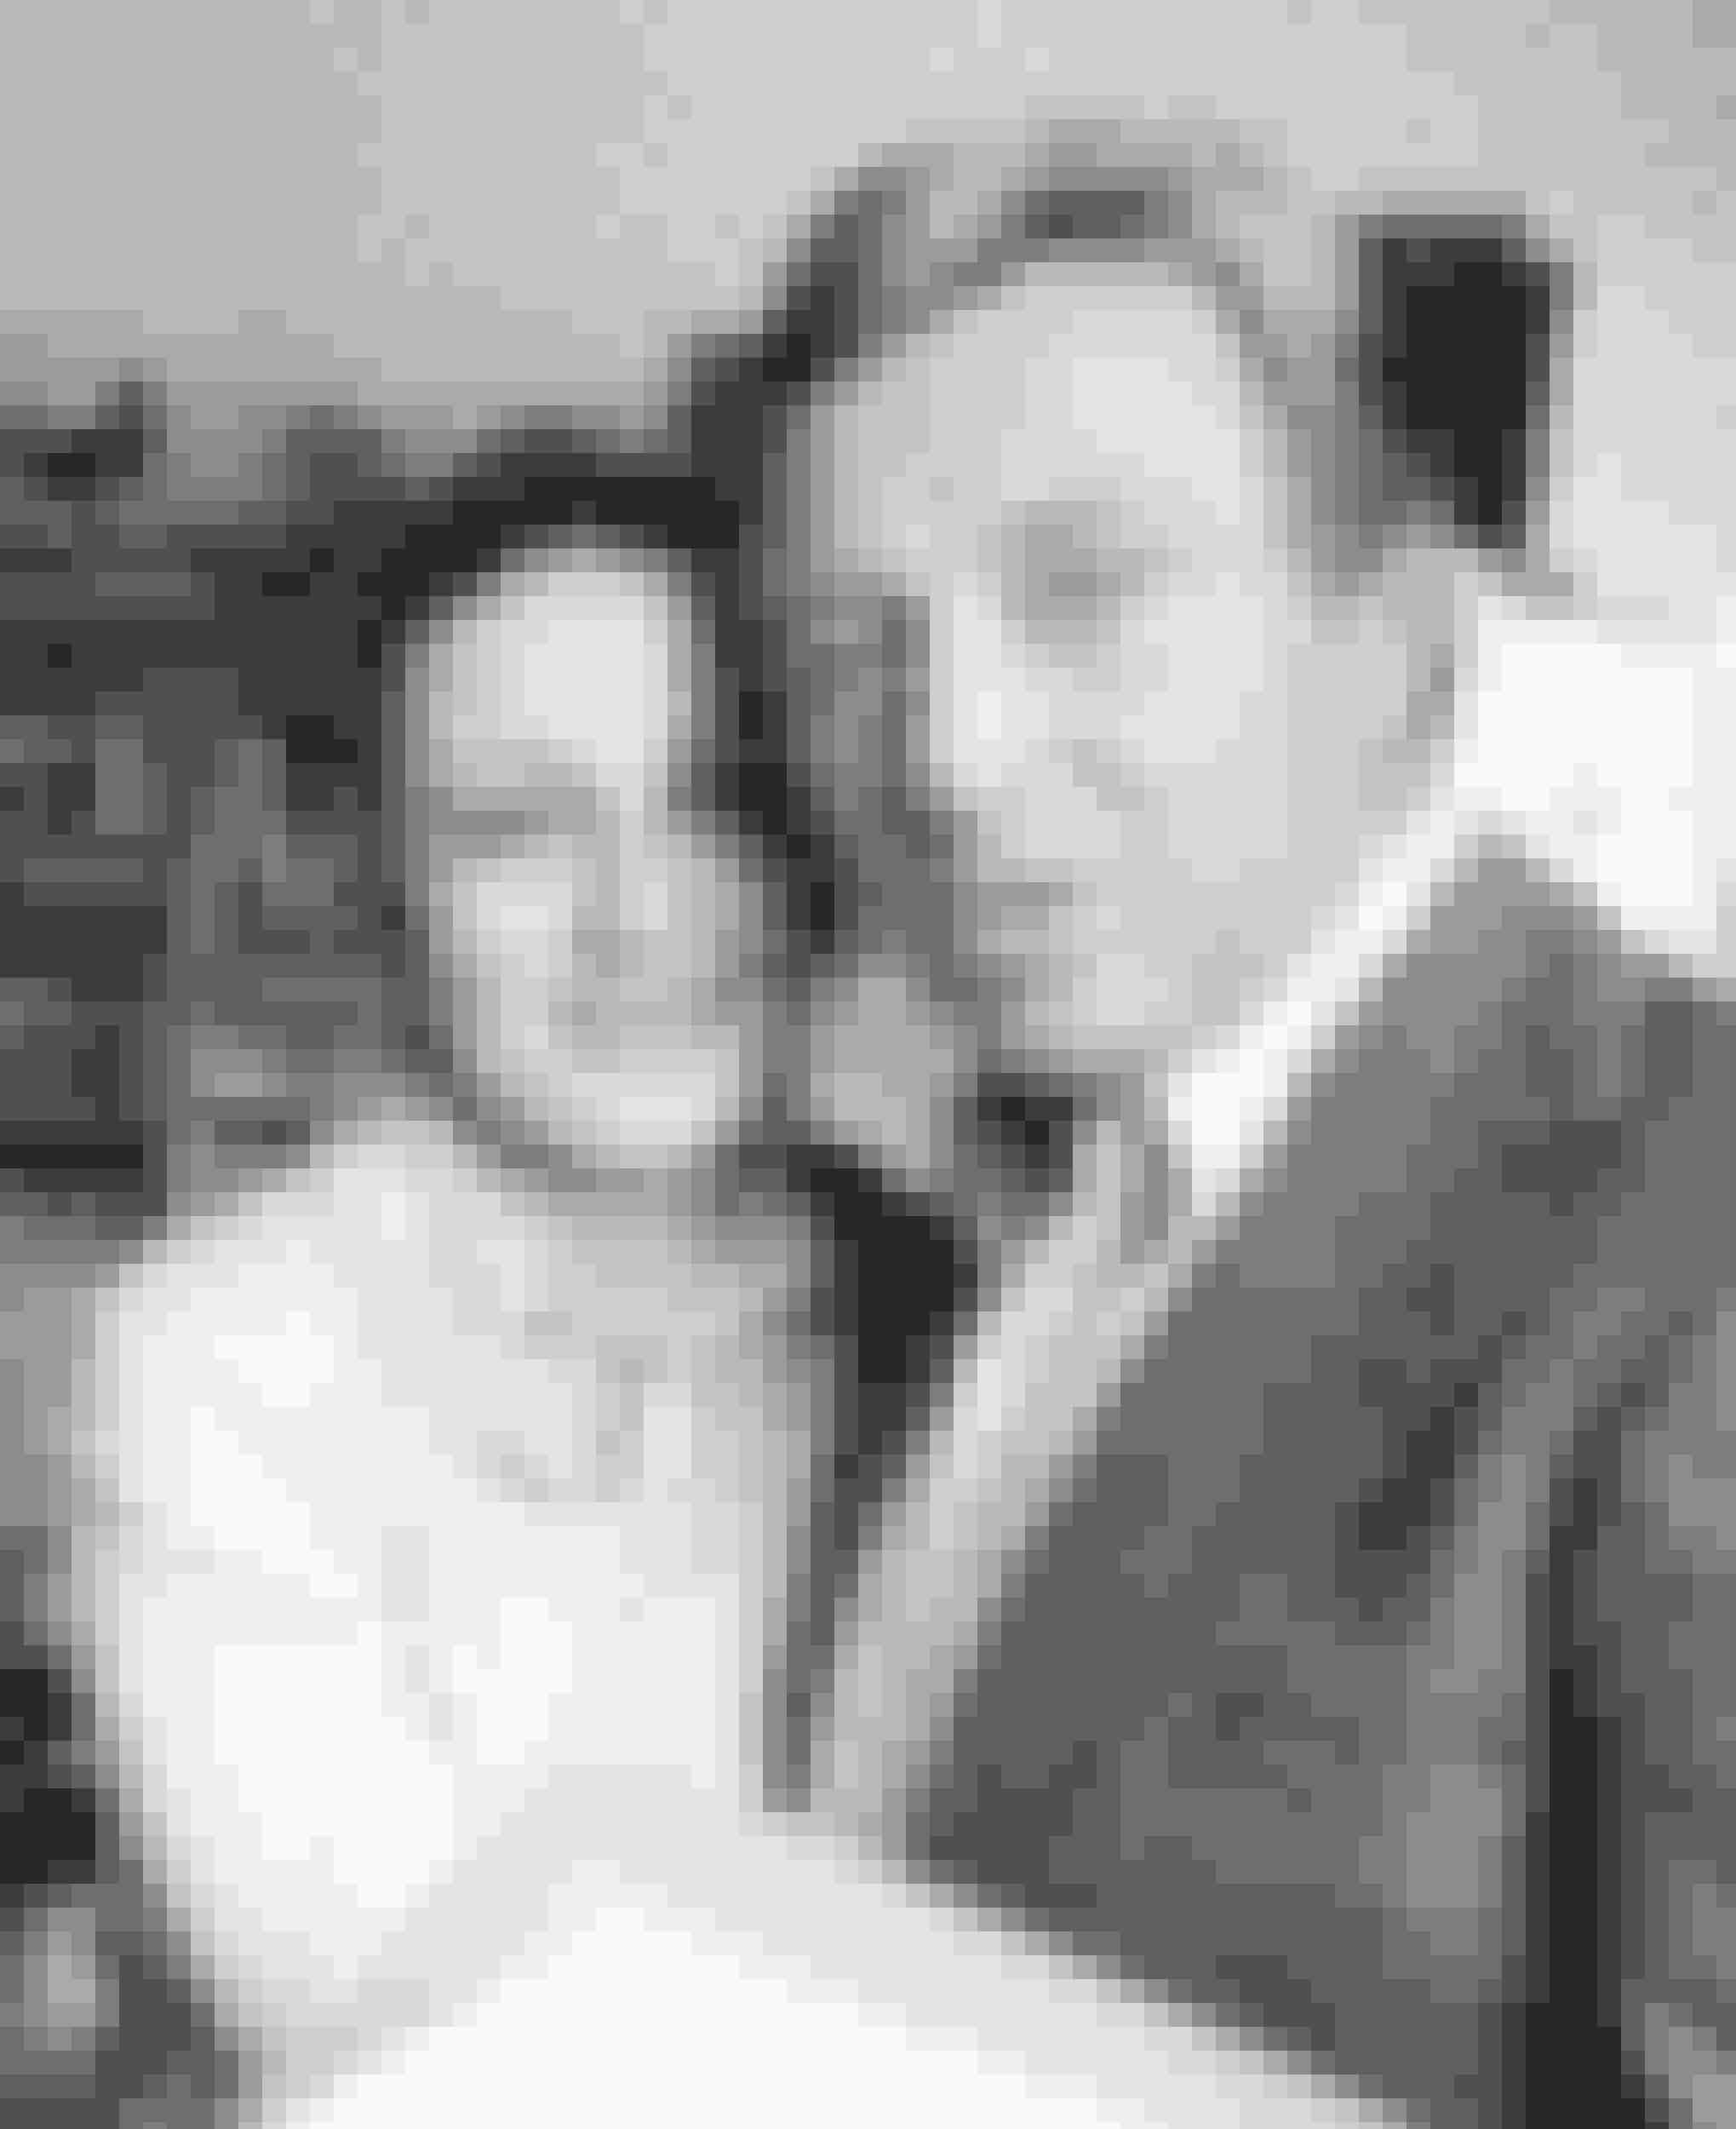 Serien gik også tæt på de to politifolks privatliv, her Henning Moritzen (Eriksen) med Ulla Jessen (Lisbeth Frandsen).